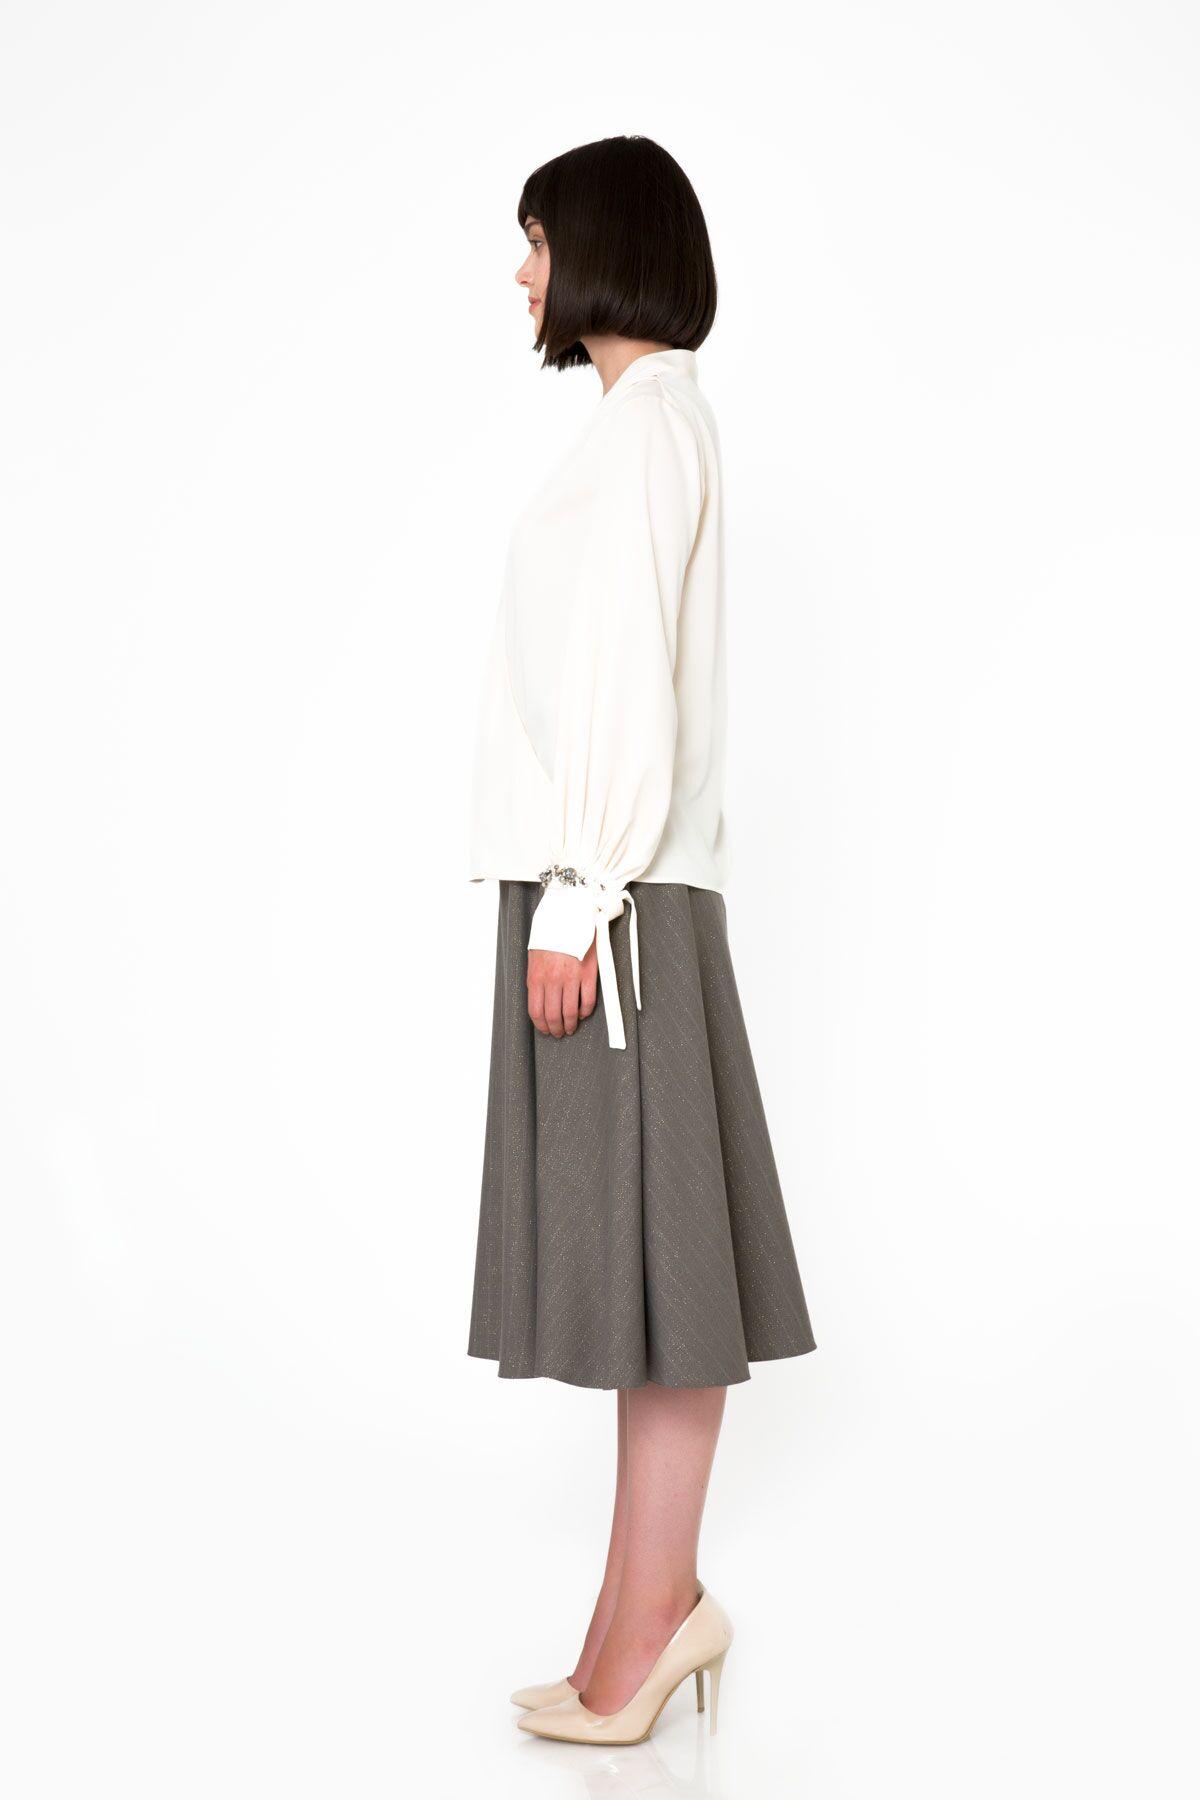 Metallic Striped Fabric Midi Gray Flared Skirt